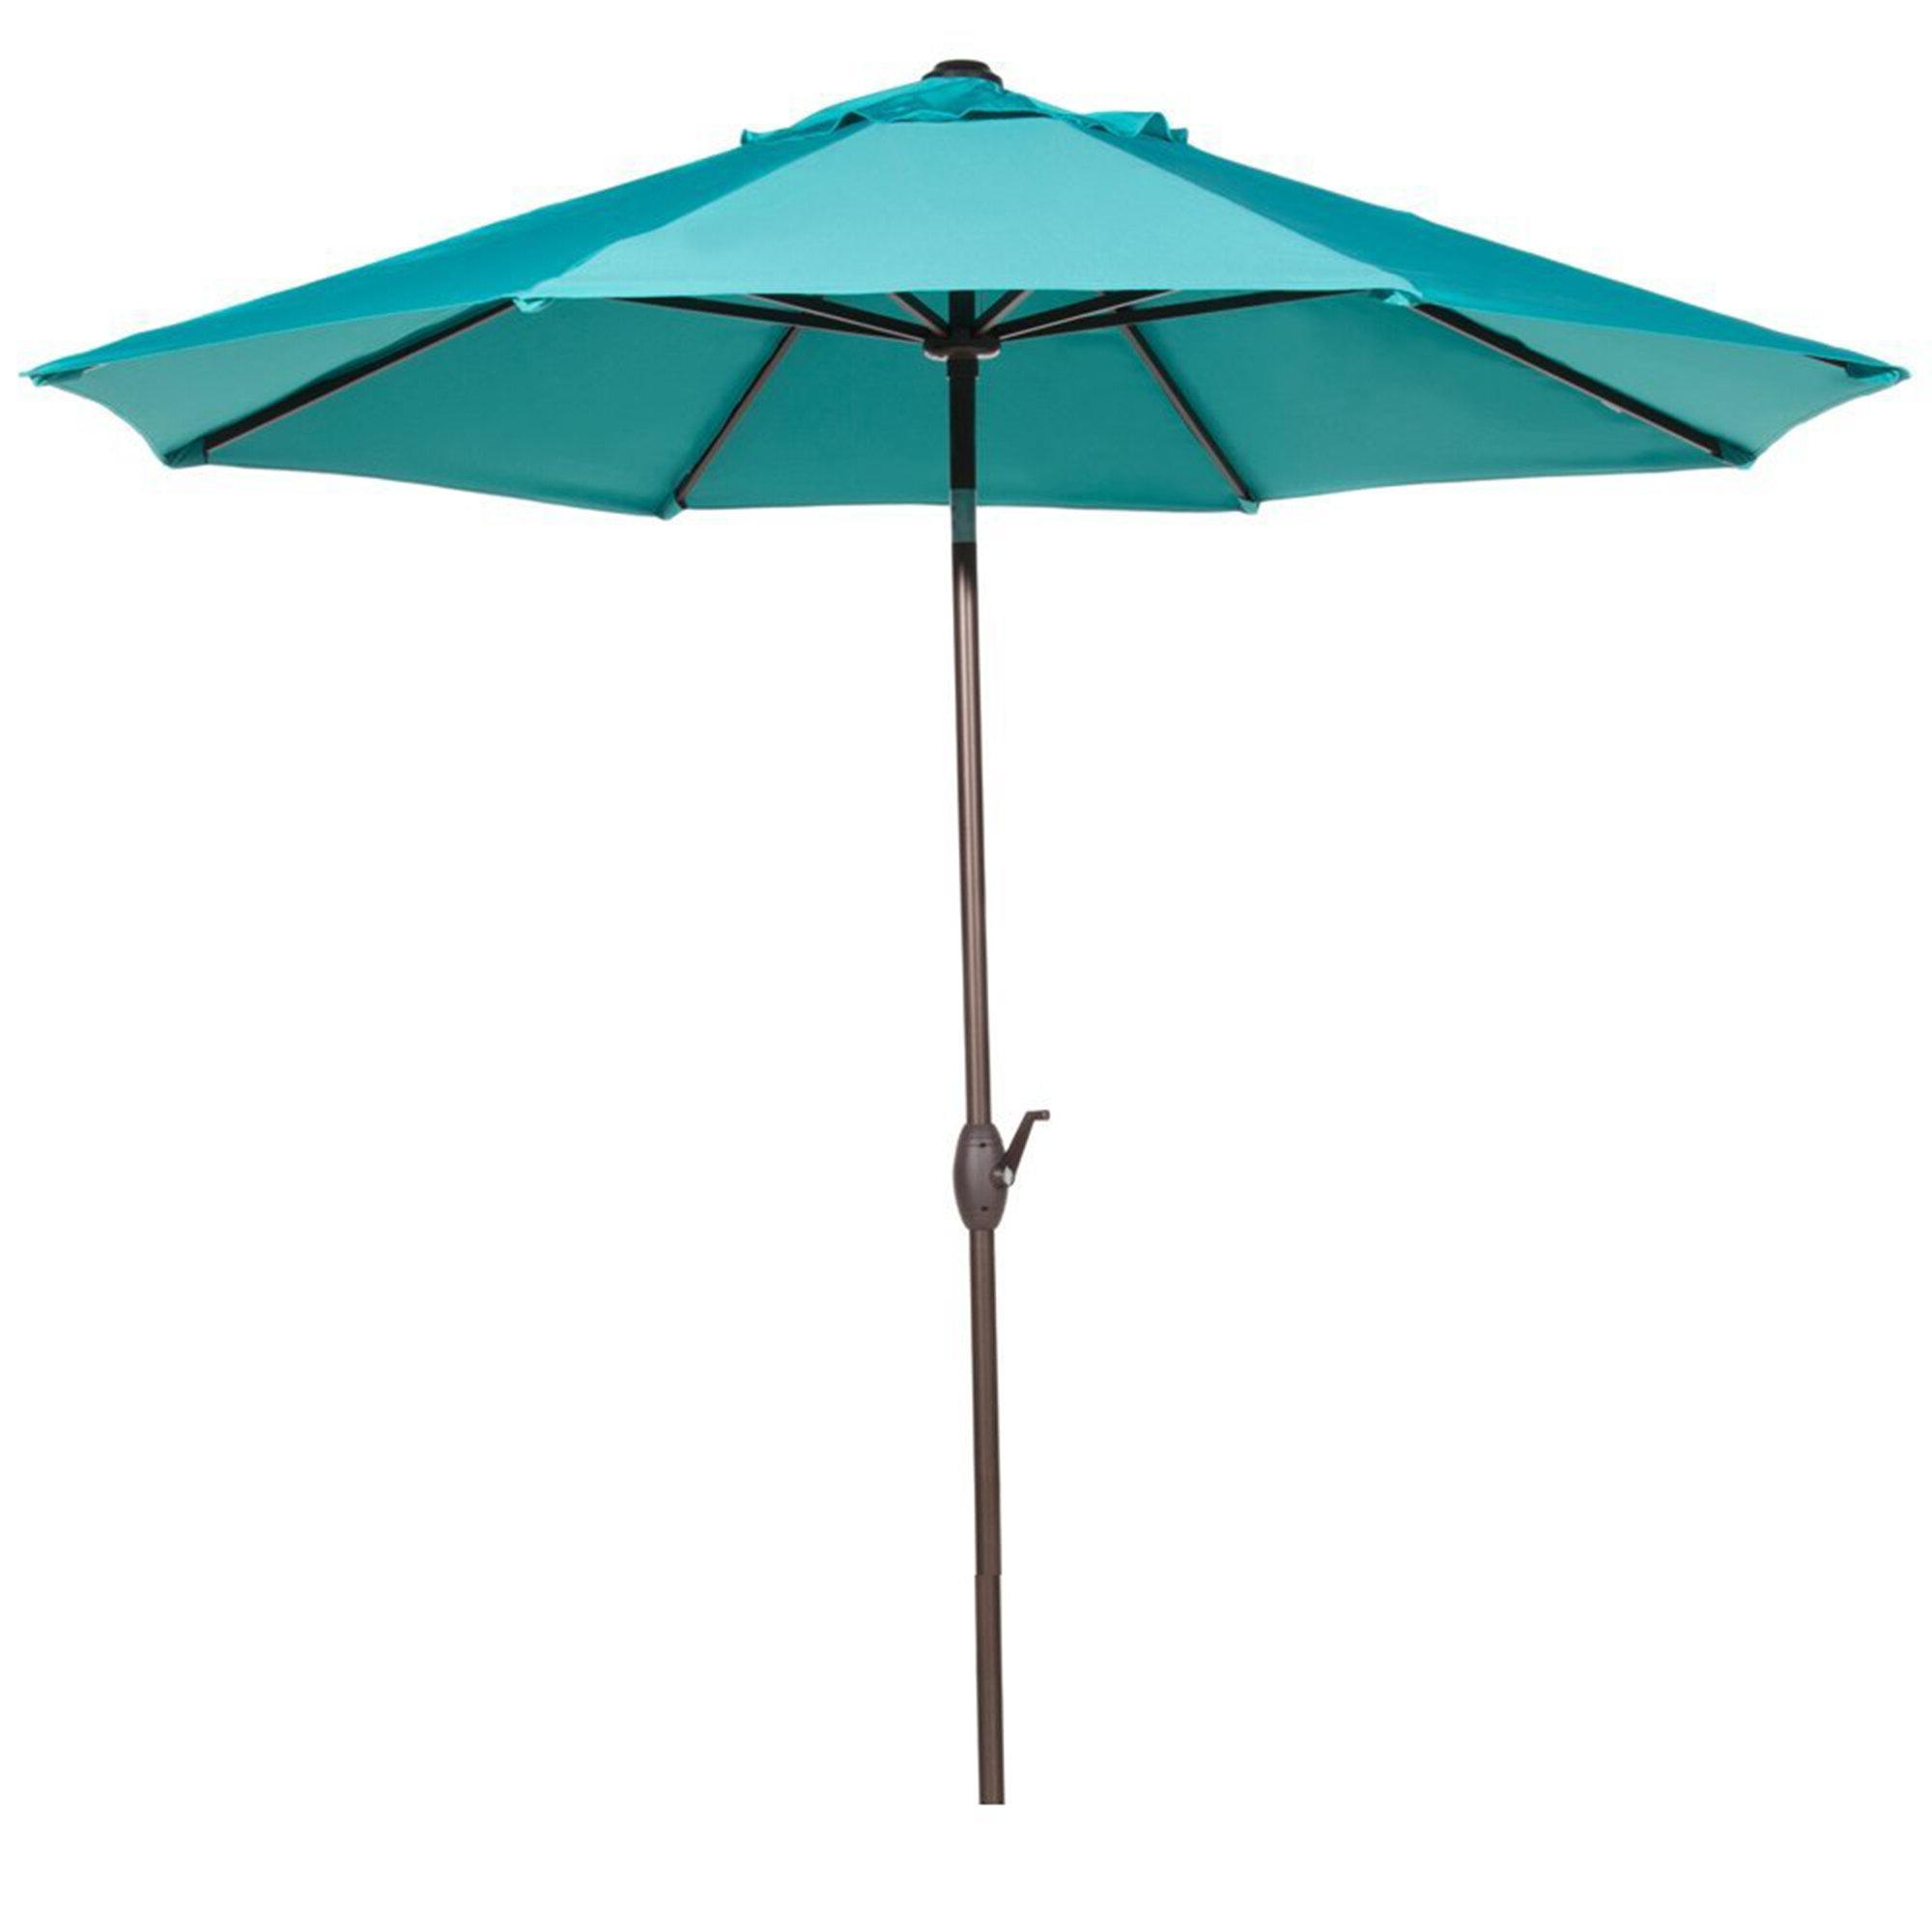 Most Popular Winchester Zipcode Design 9' Market Umbrella Intended For Hapeville Market Umbrellas (View 12 of 20)